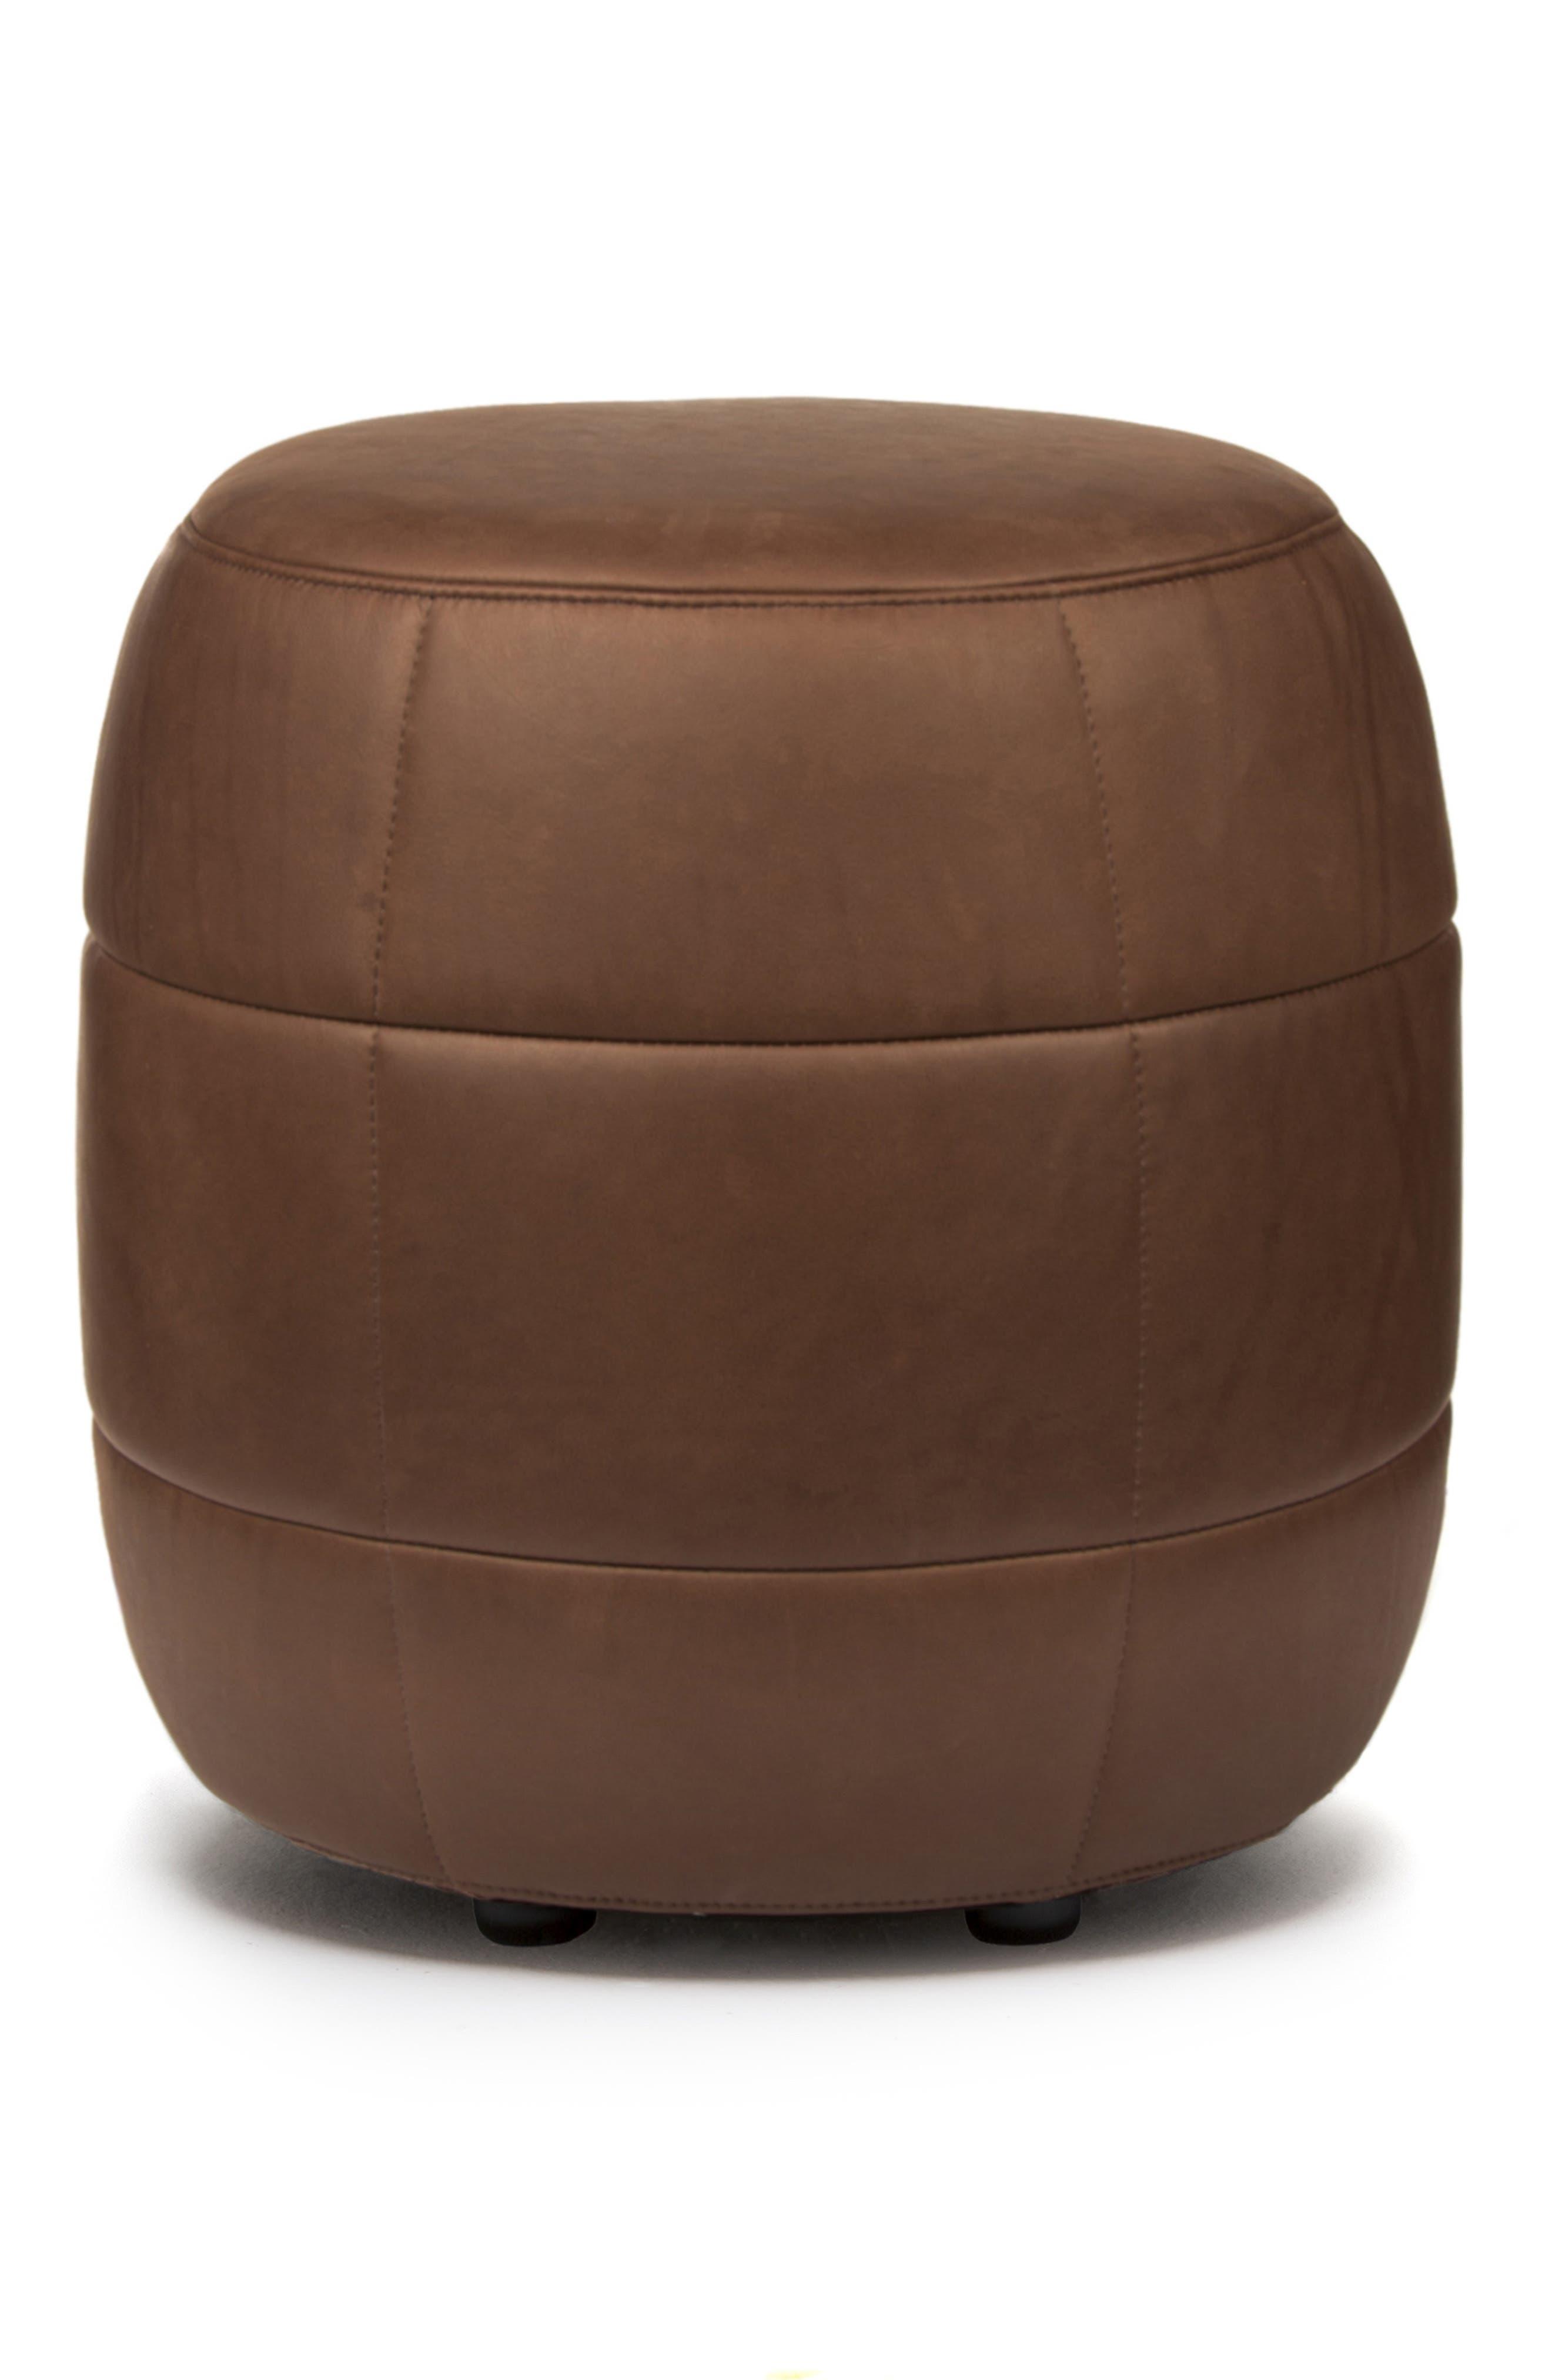 Main Image - Design on Stock USA Barrell Leather Stool